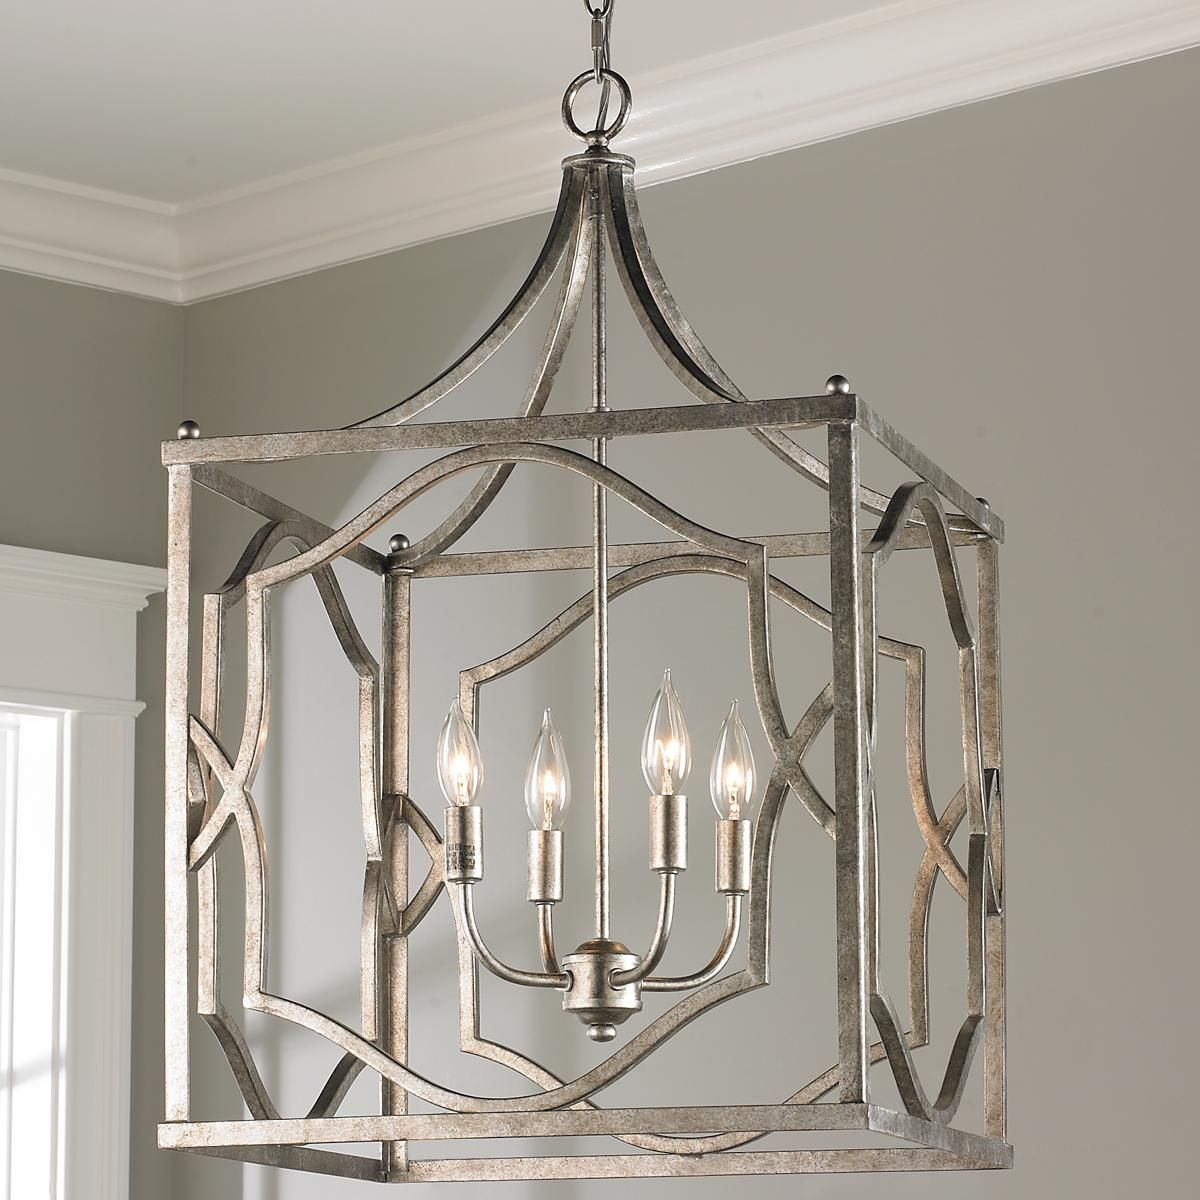 lantern kitchen lighting stainless steel carts modern fretwork cage medium florida house